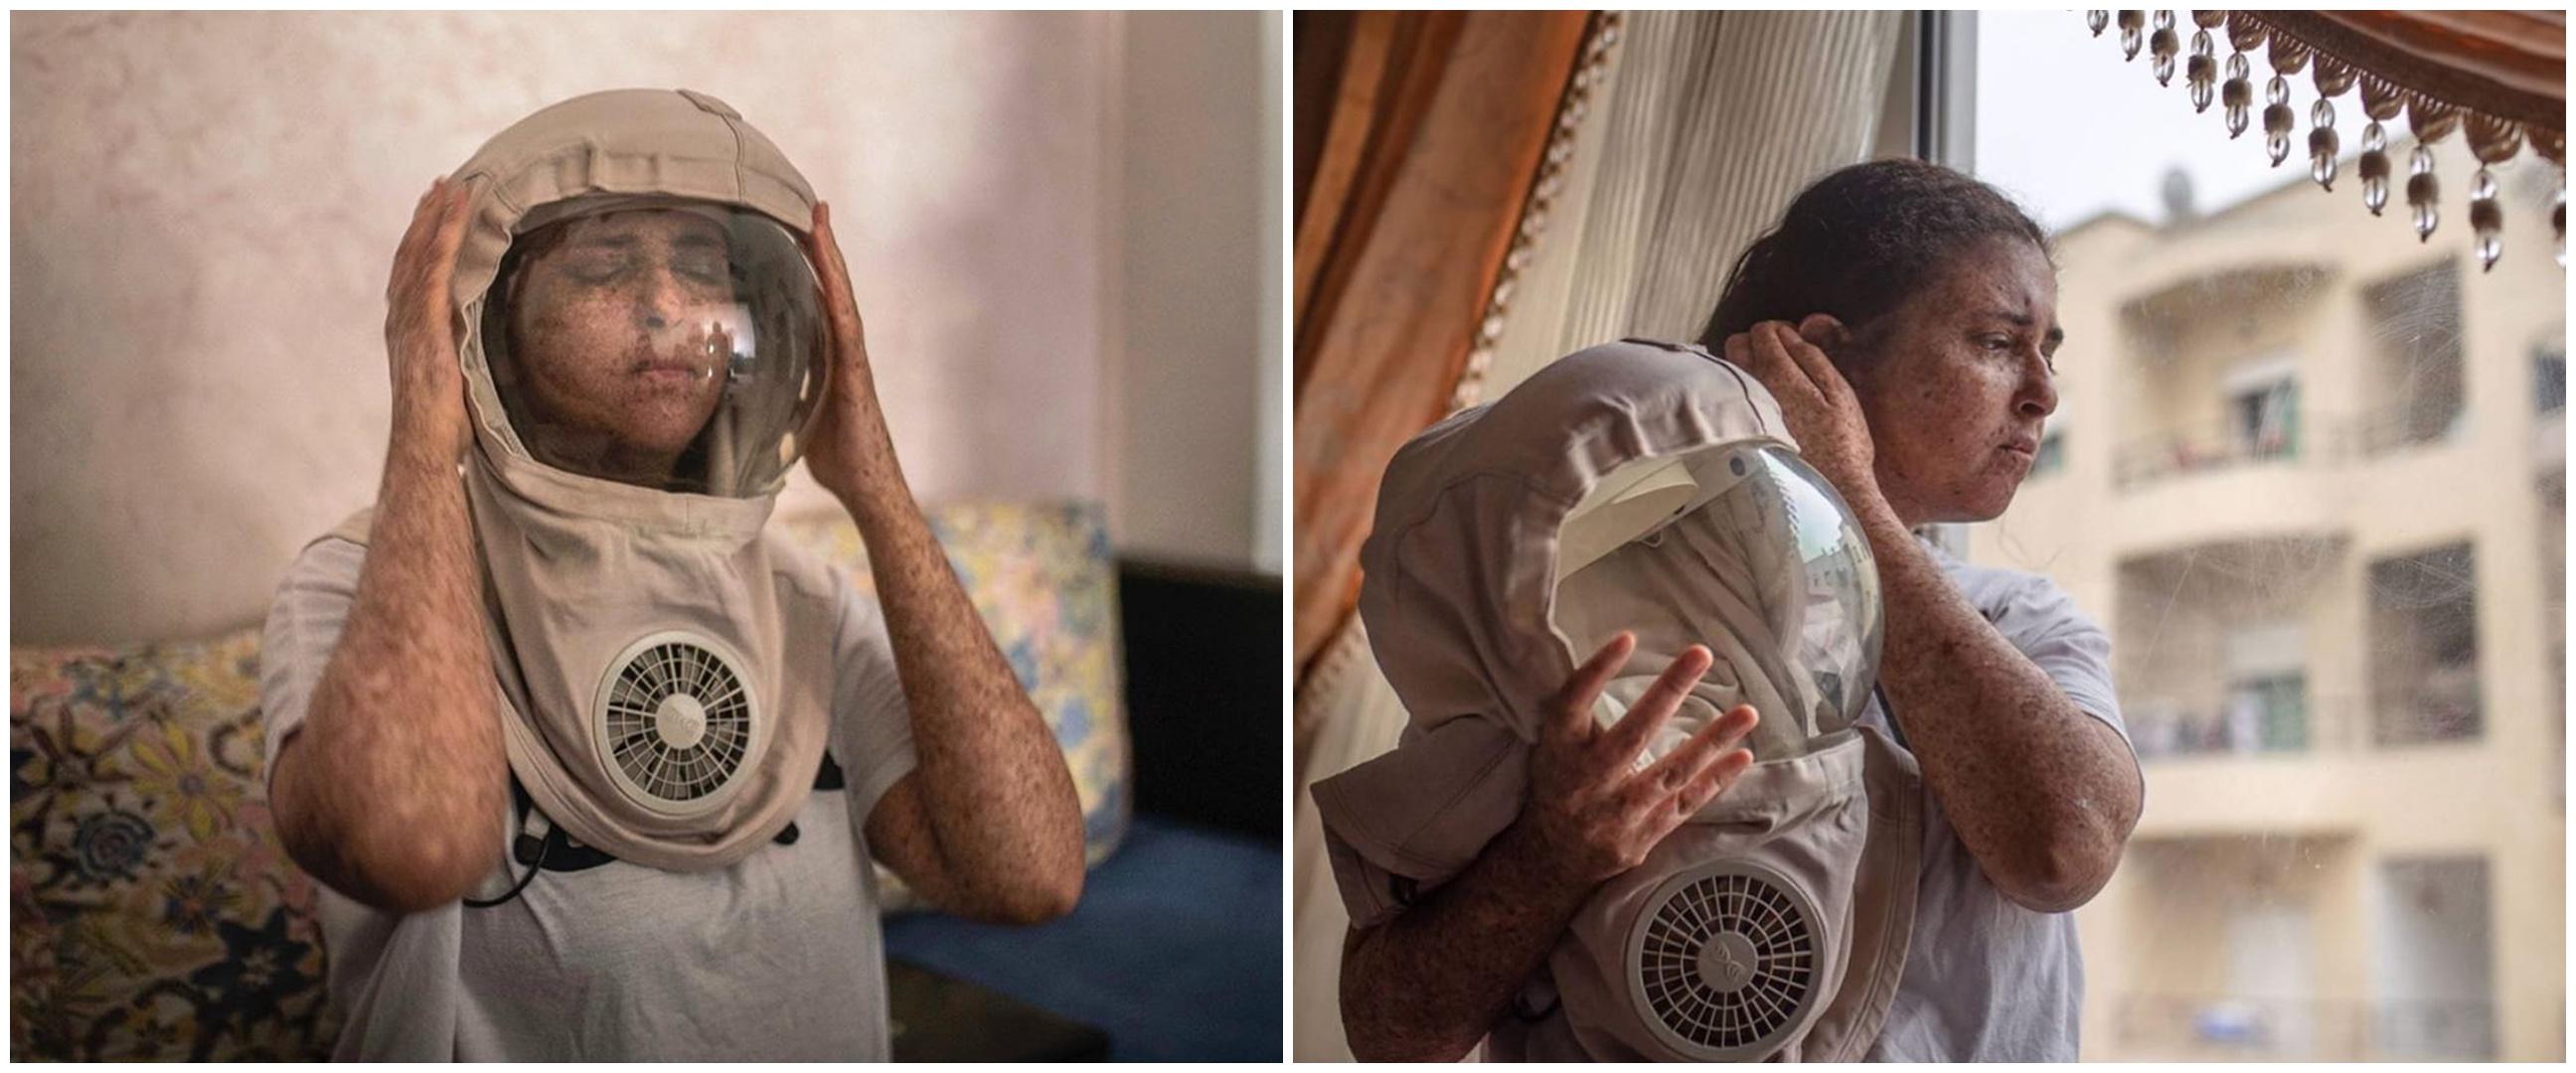 Kisah wanita pakai helm 20 tahun jika ke luar rumah, ini 8 potretnya